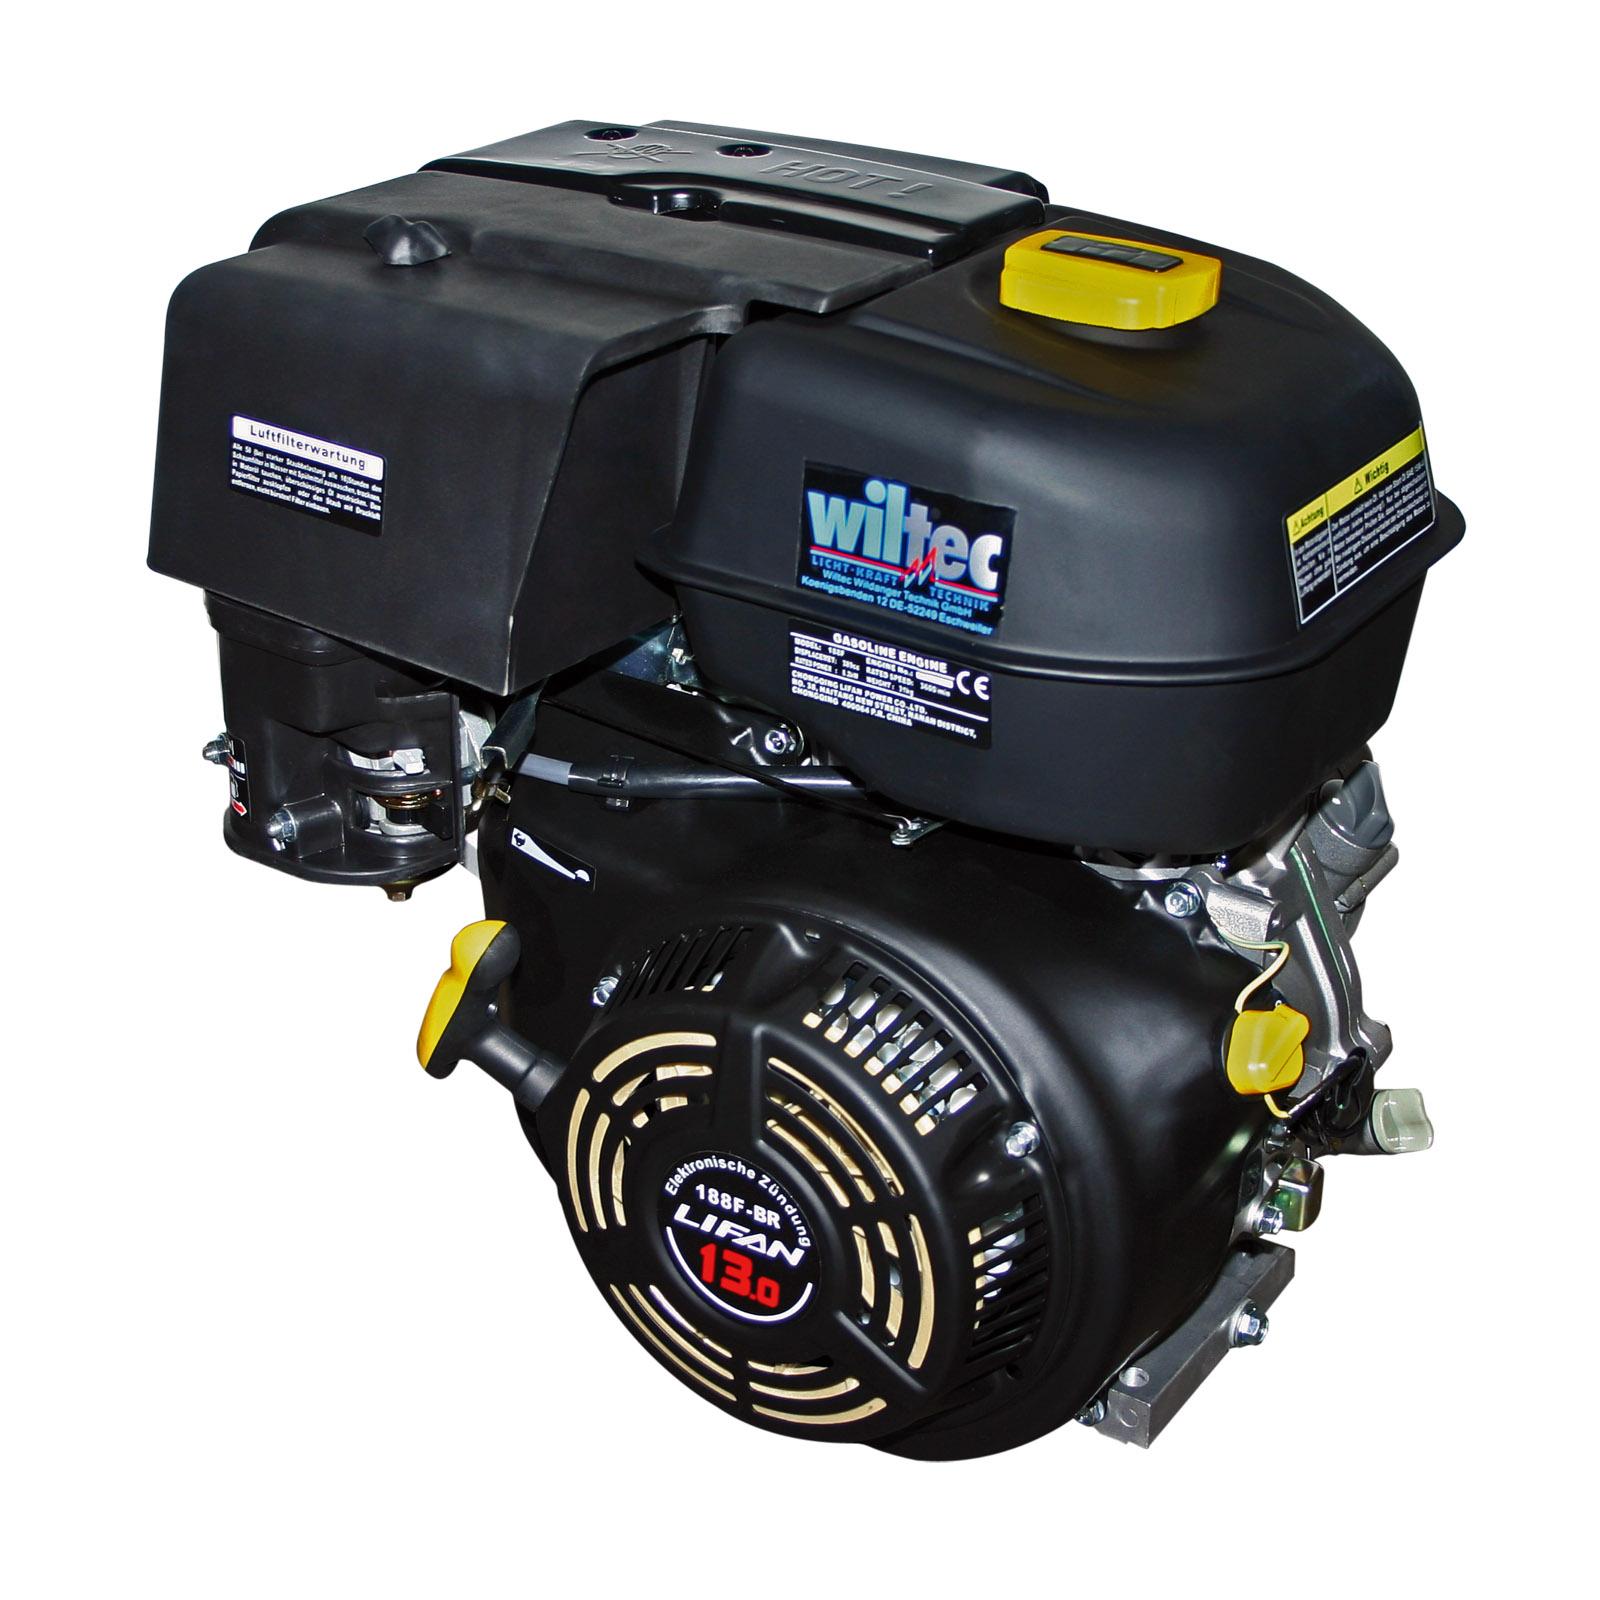 Lifan 188 Petrol Gasoline Engine 9 5kw 13hp Wet Clutch